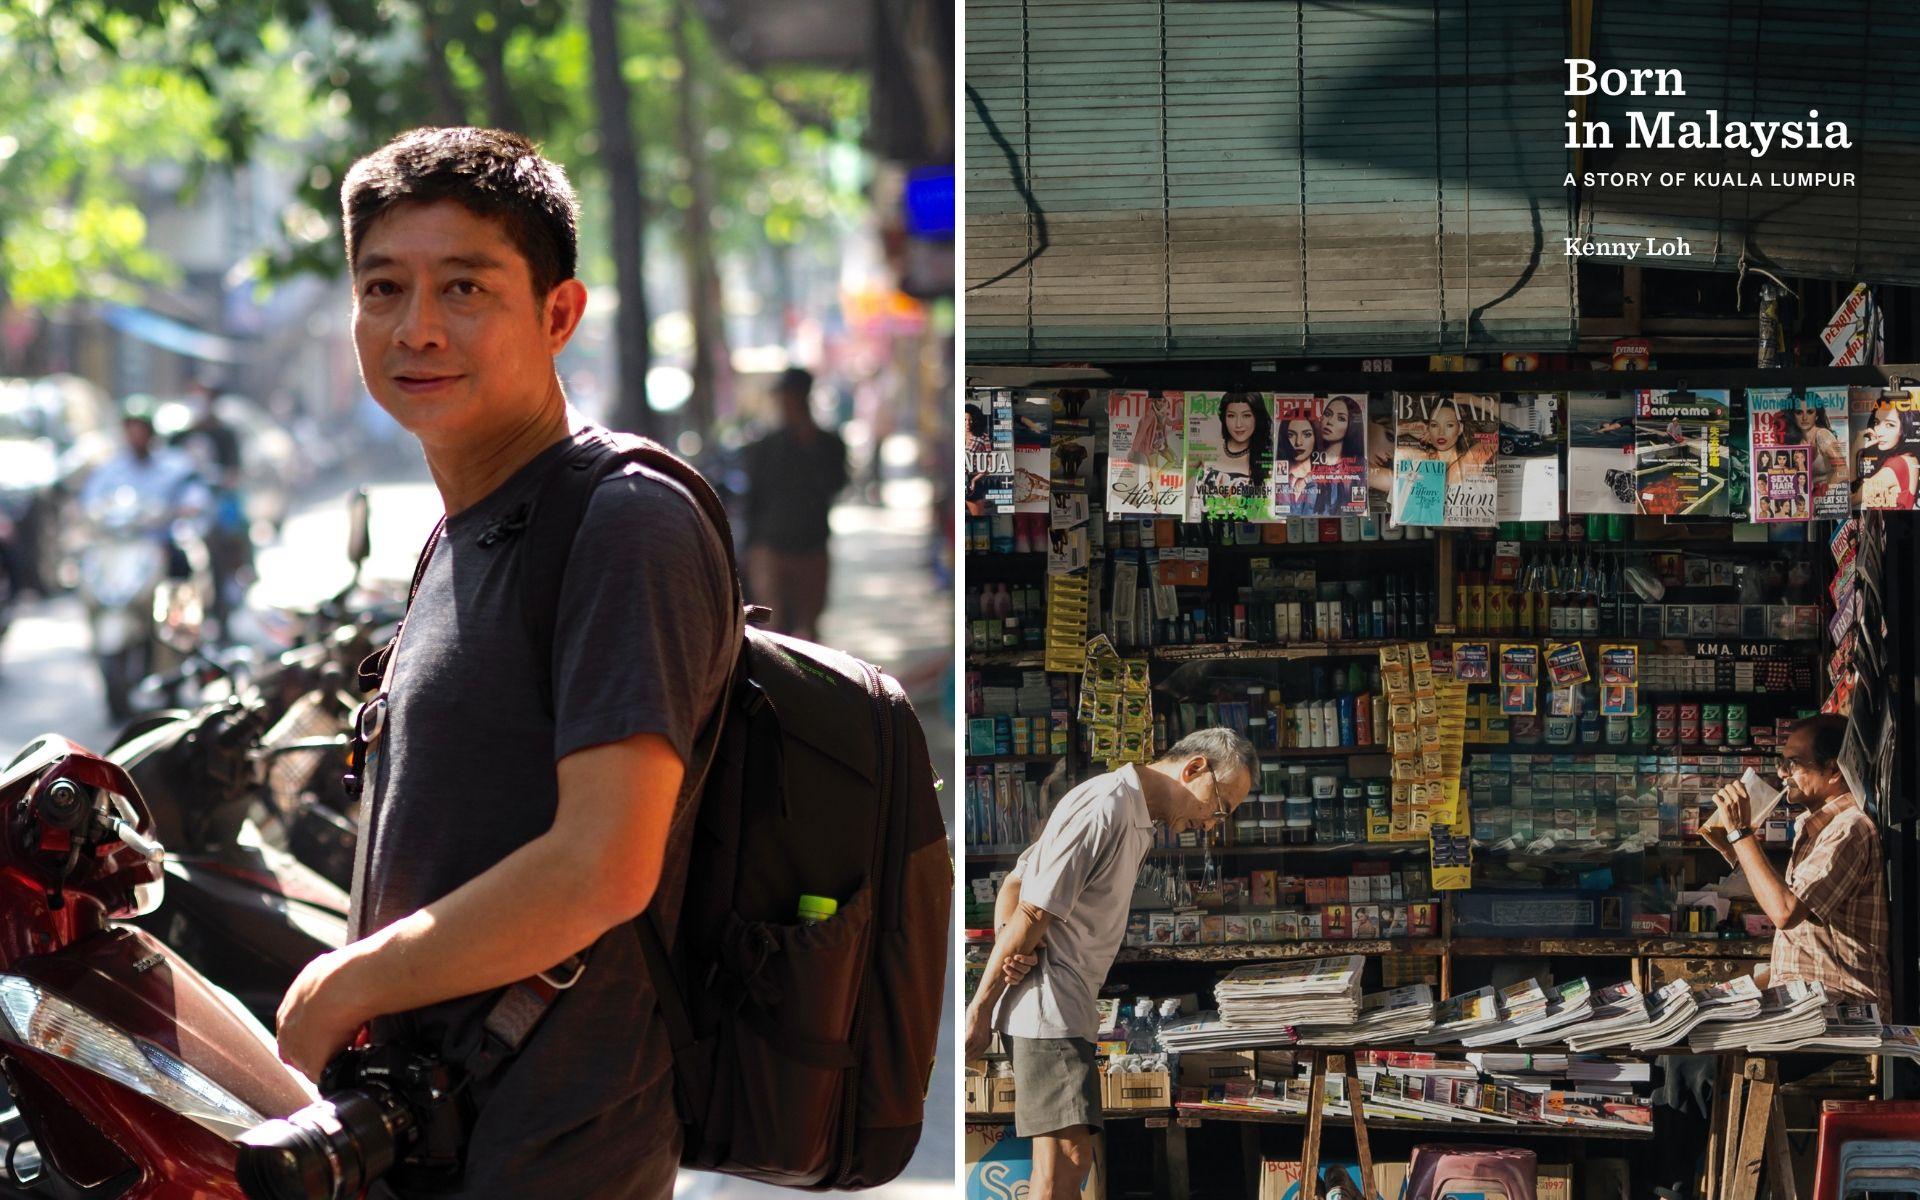 Storyteller & Photographer, Kenny Loh, On Framing Malaysia's Diverse Residents